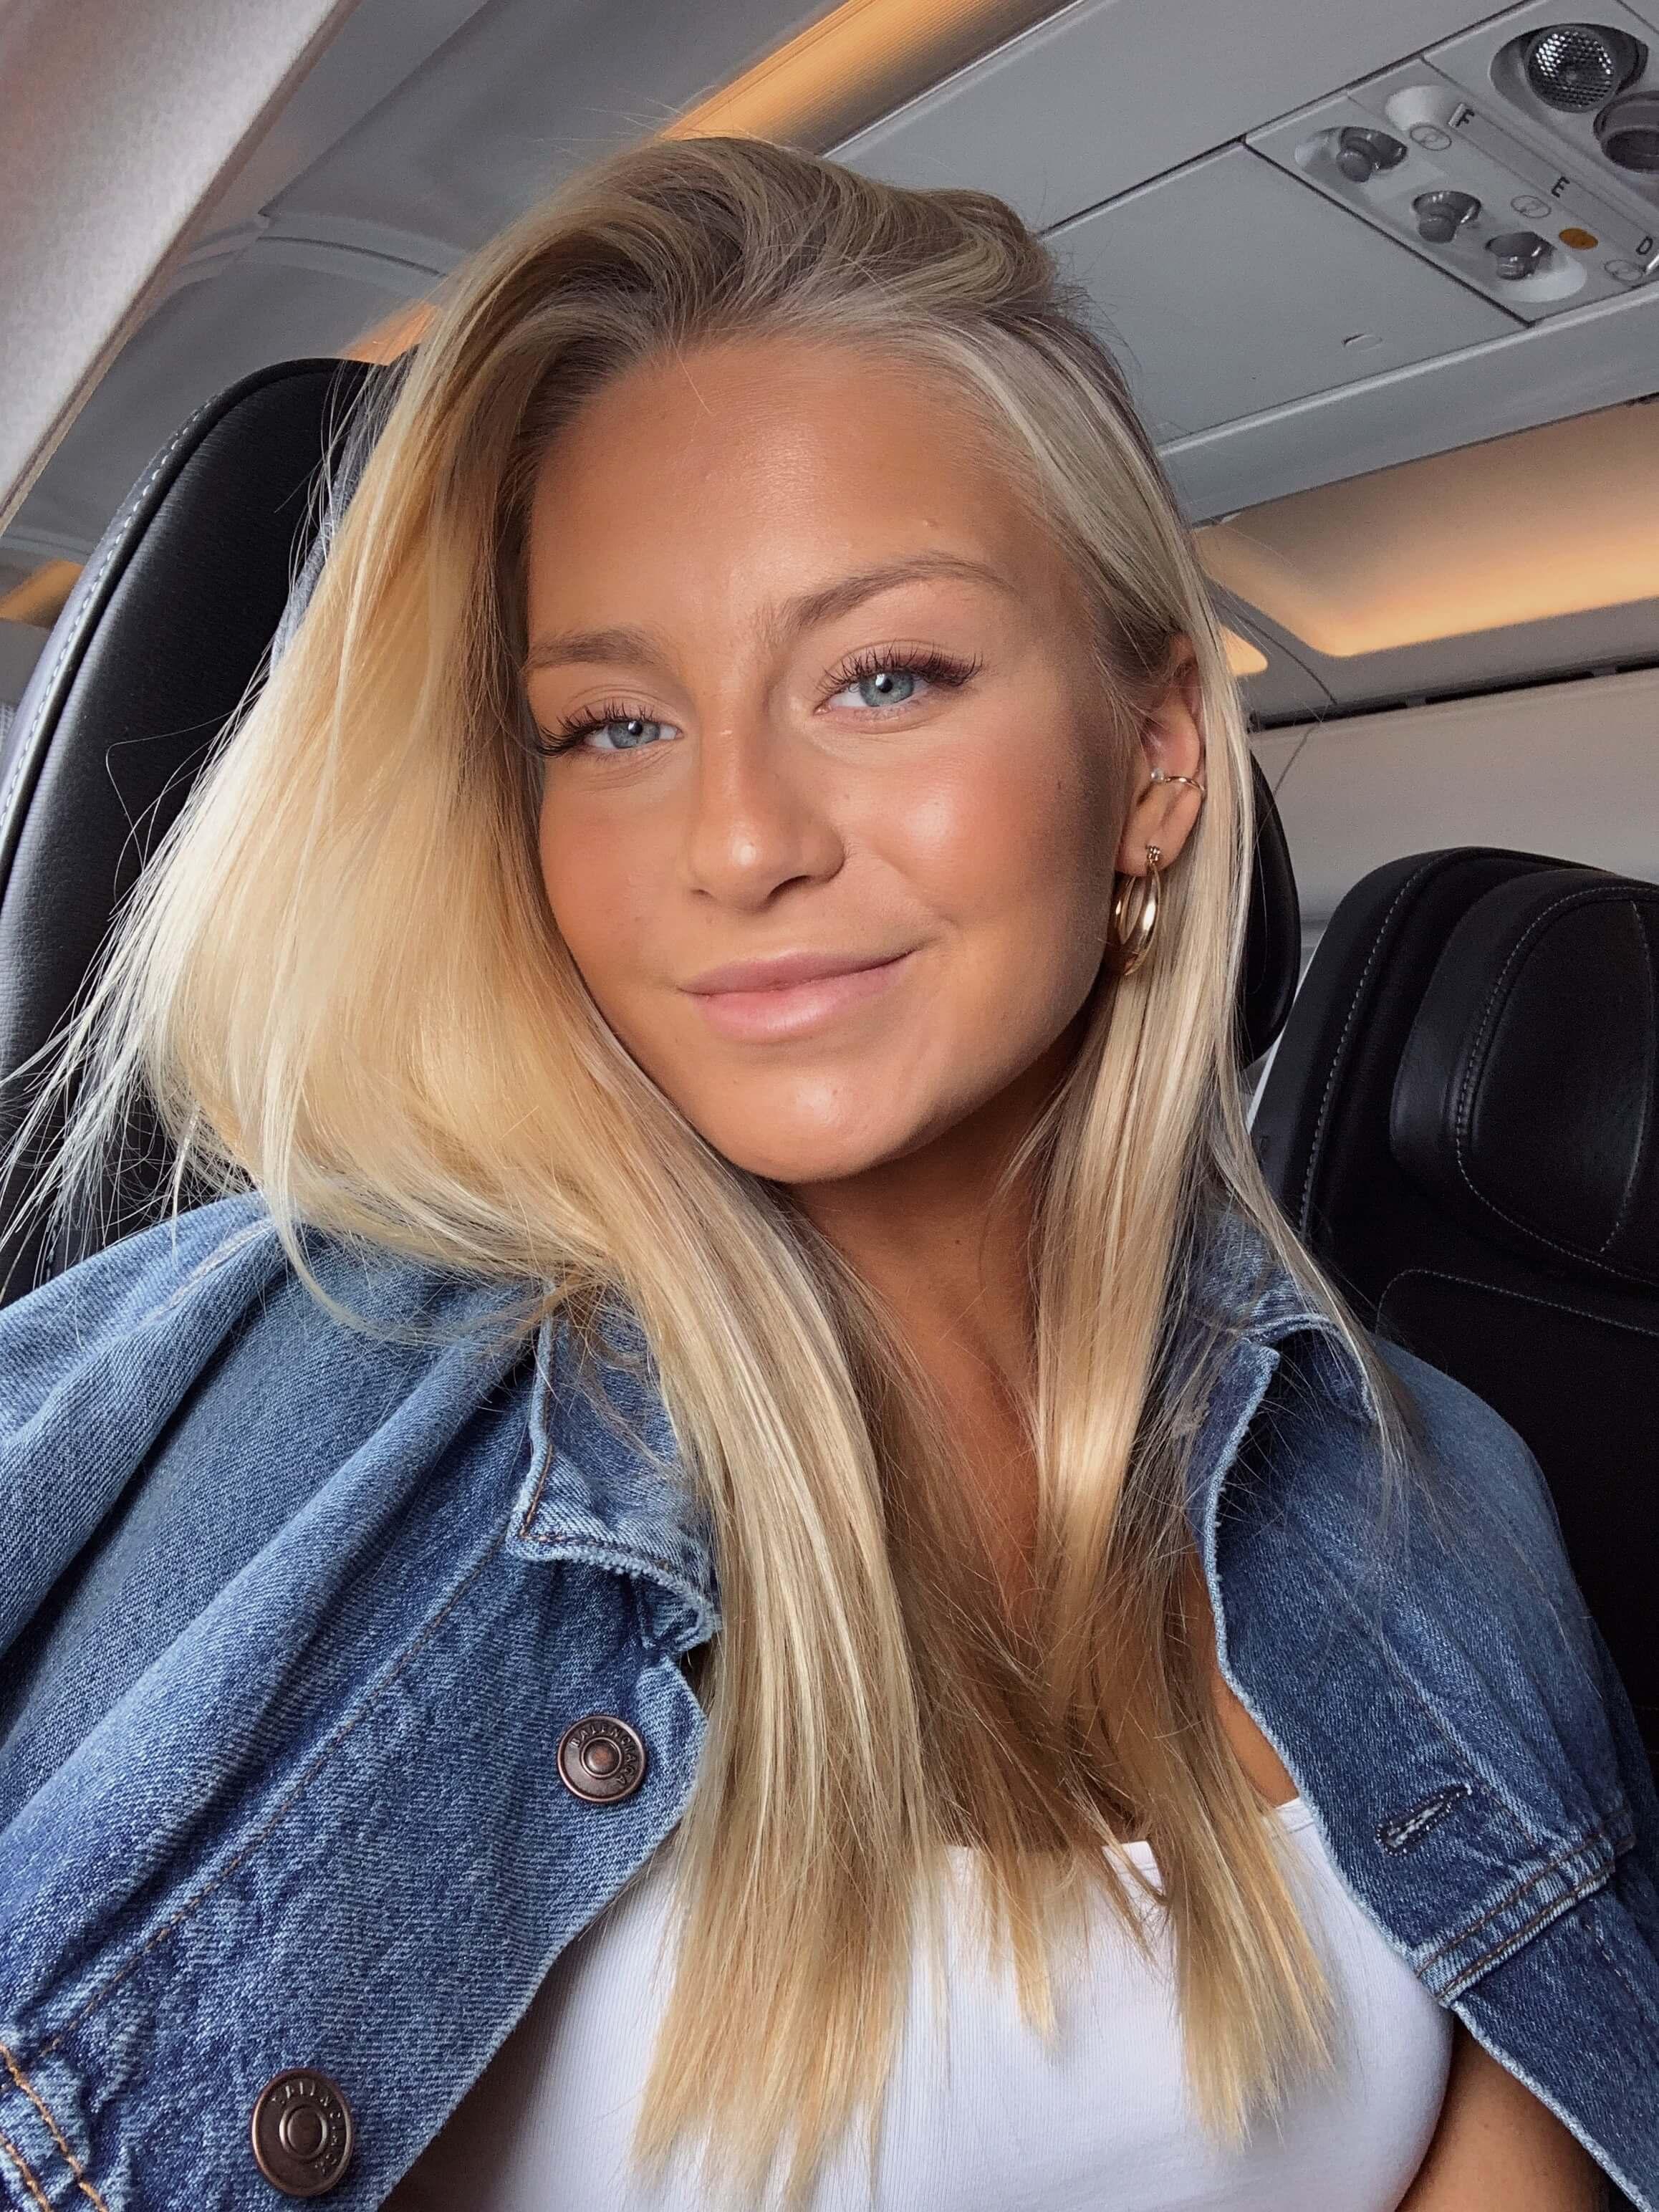 Classify Swedish girl - AnthroScape